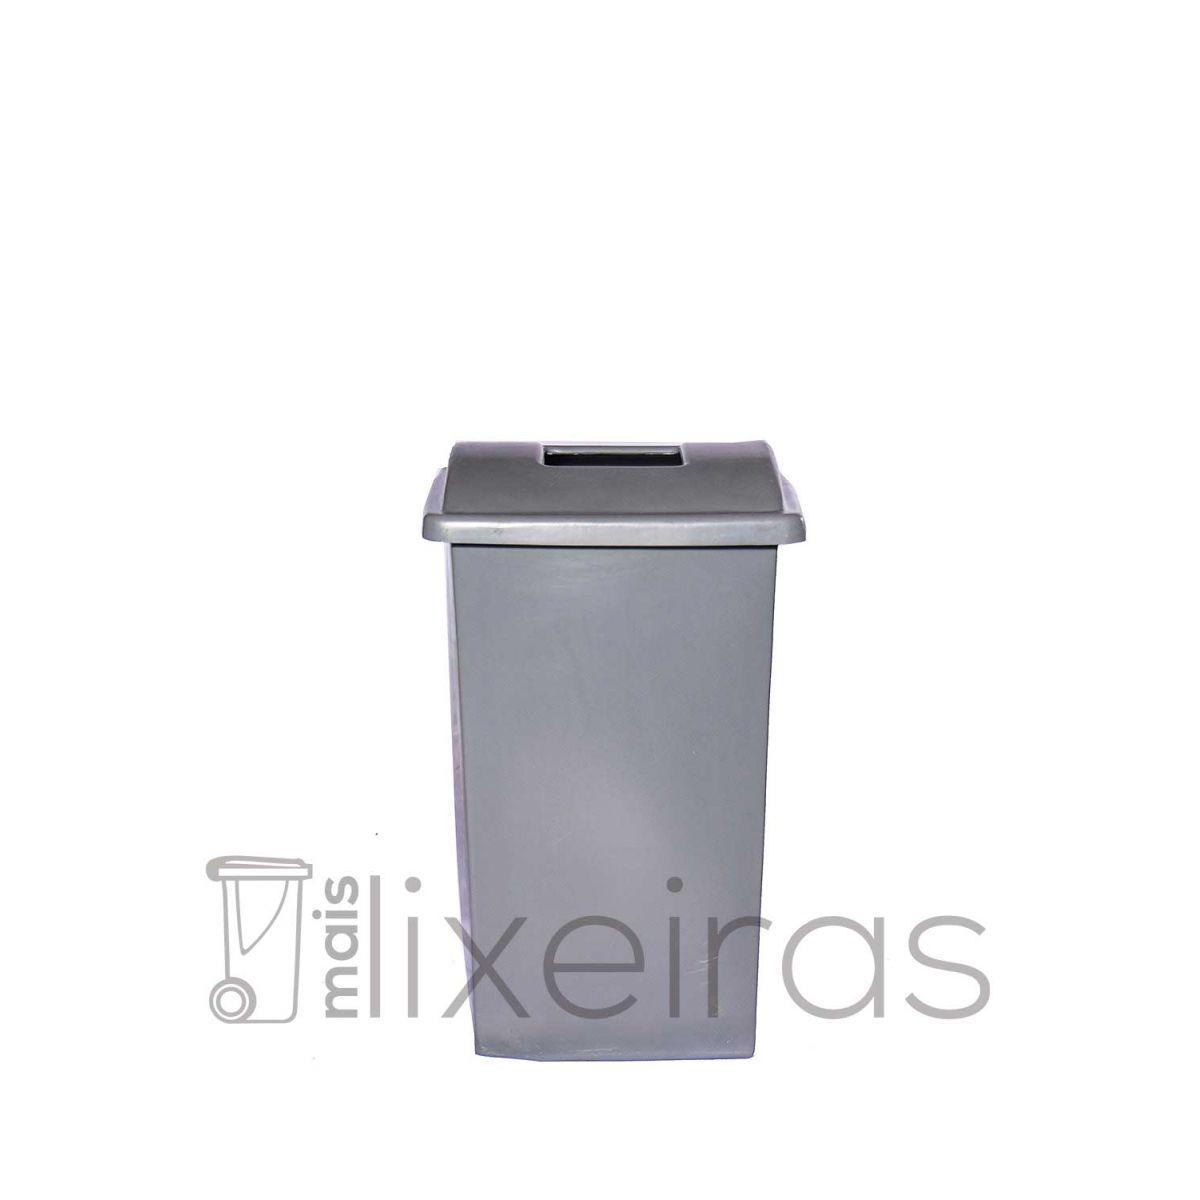 Lixeira grande para coleta seletiva - tampa personalizada - 100 litros